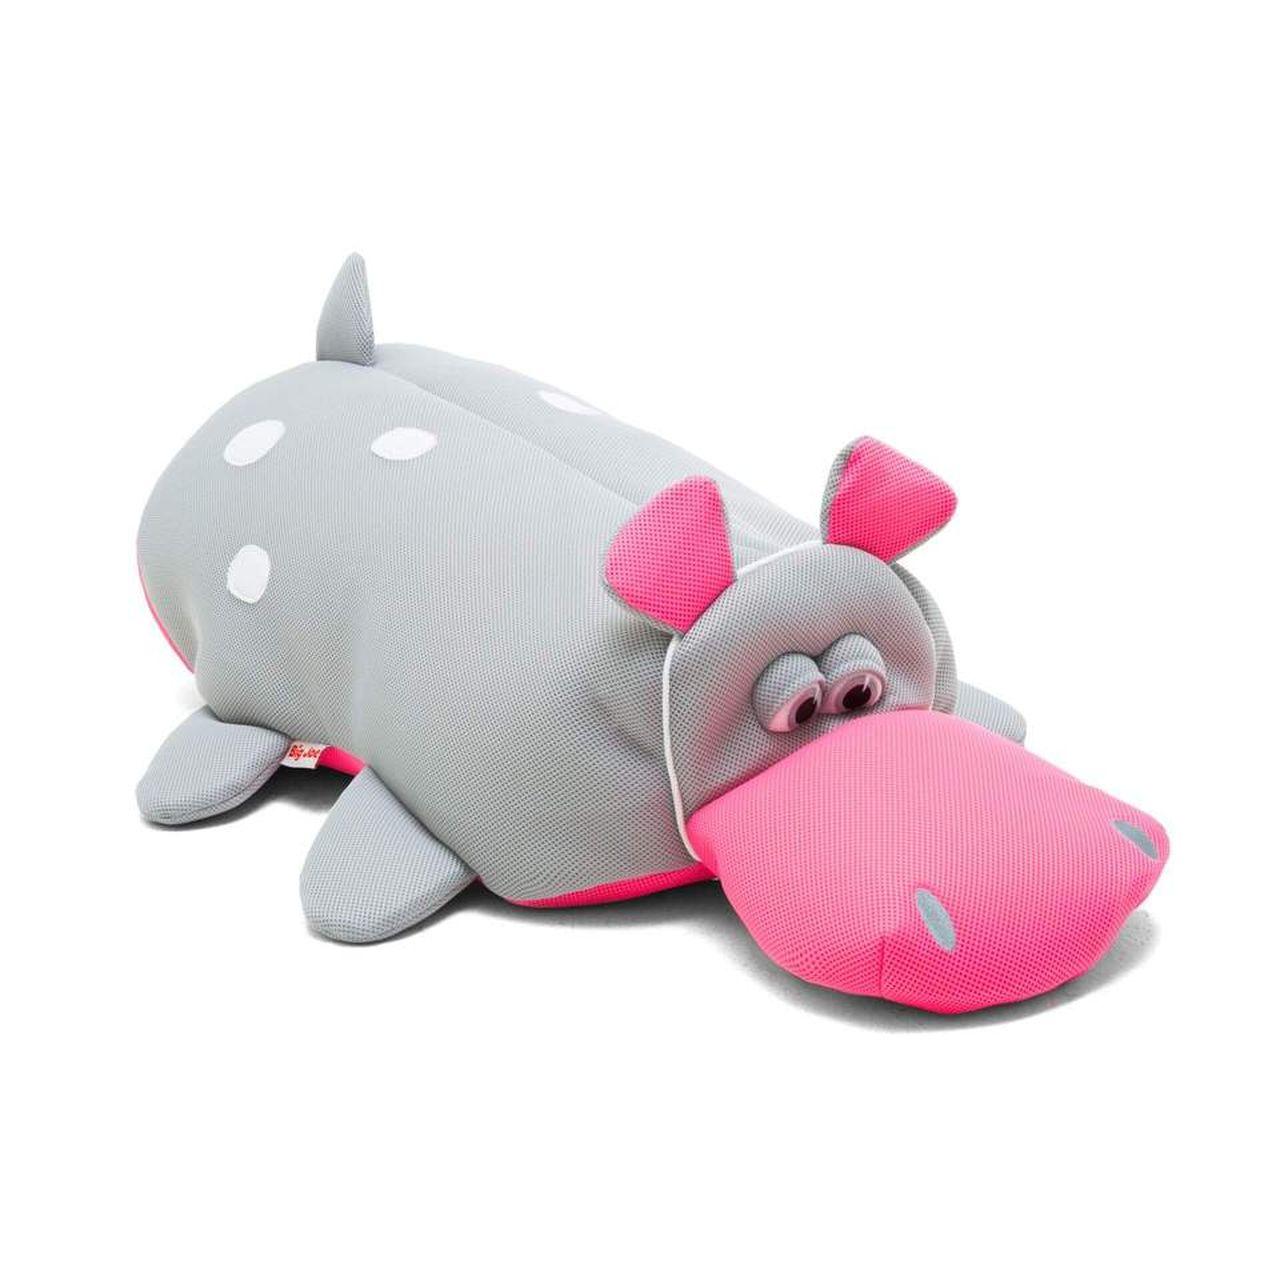 Big Joe Pool Petz Large Pool Float - Hippo 2